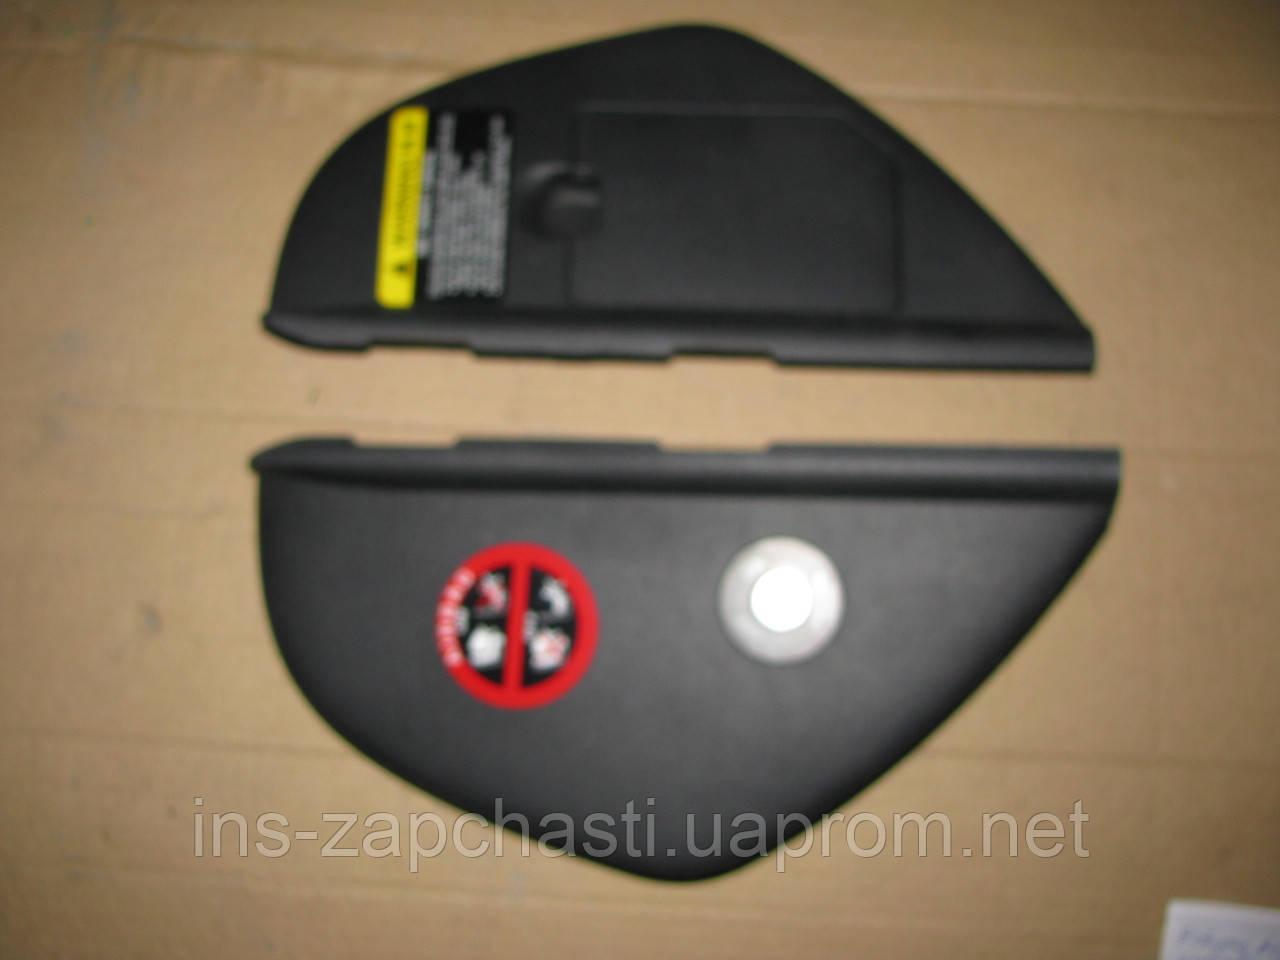 Панель обшивки салону ліва (боки торпеди) 84716-2L000 Hyundai i30 2007-2011